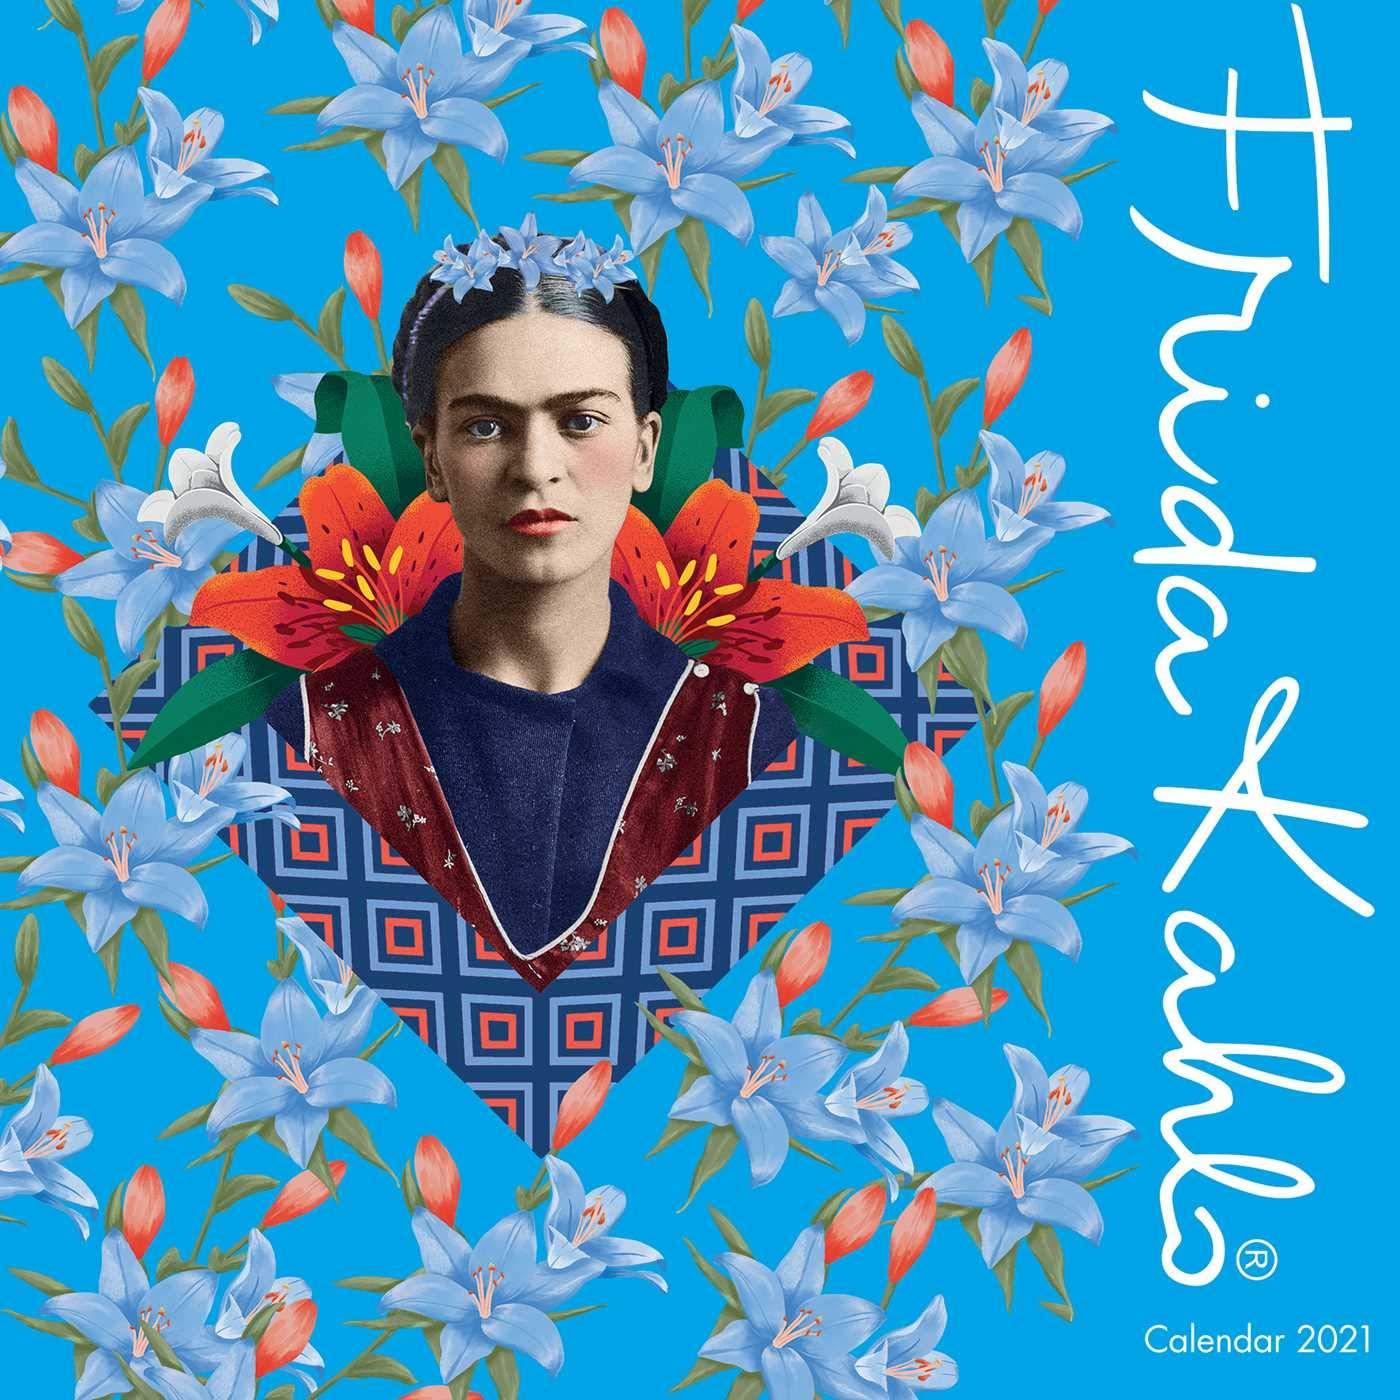 Frida Kahlo Wall Calendar 2021 (Art Calendar): Flame Tree Studio